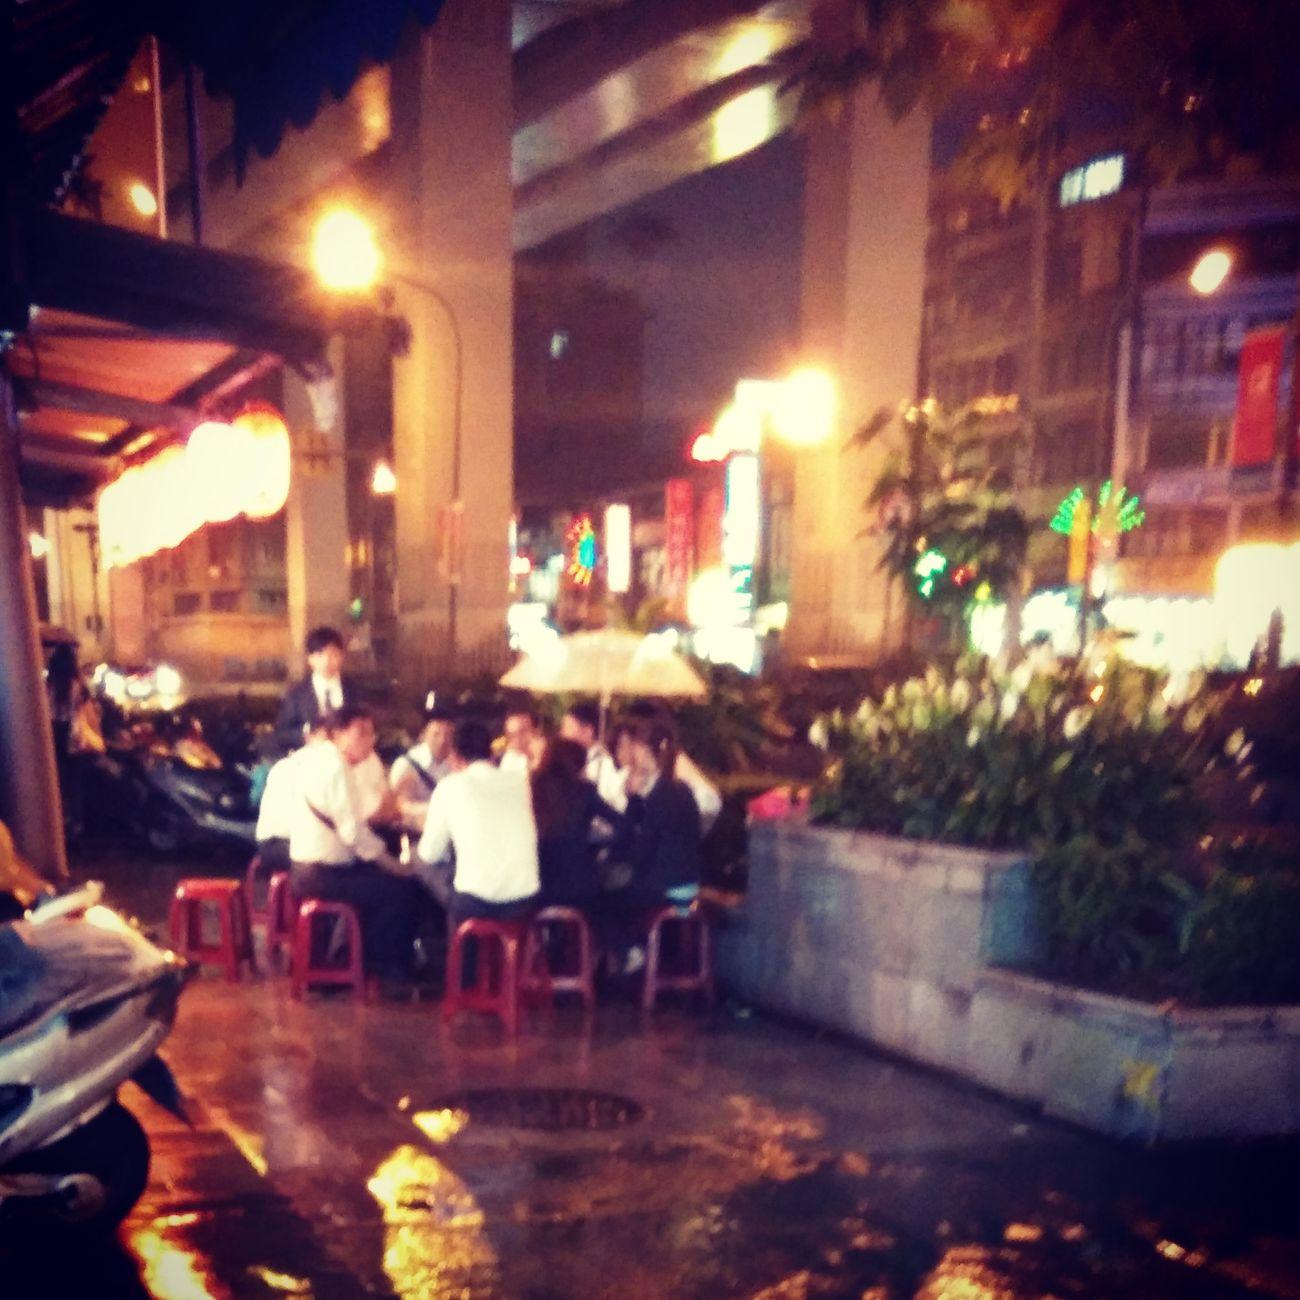 昨夜下著雨,還有人打著雨傘吃著飯 Eating Dinner Relaxing Rain